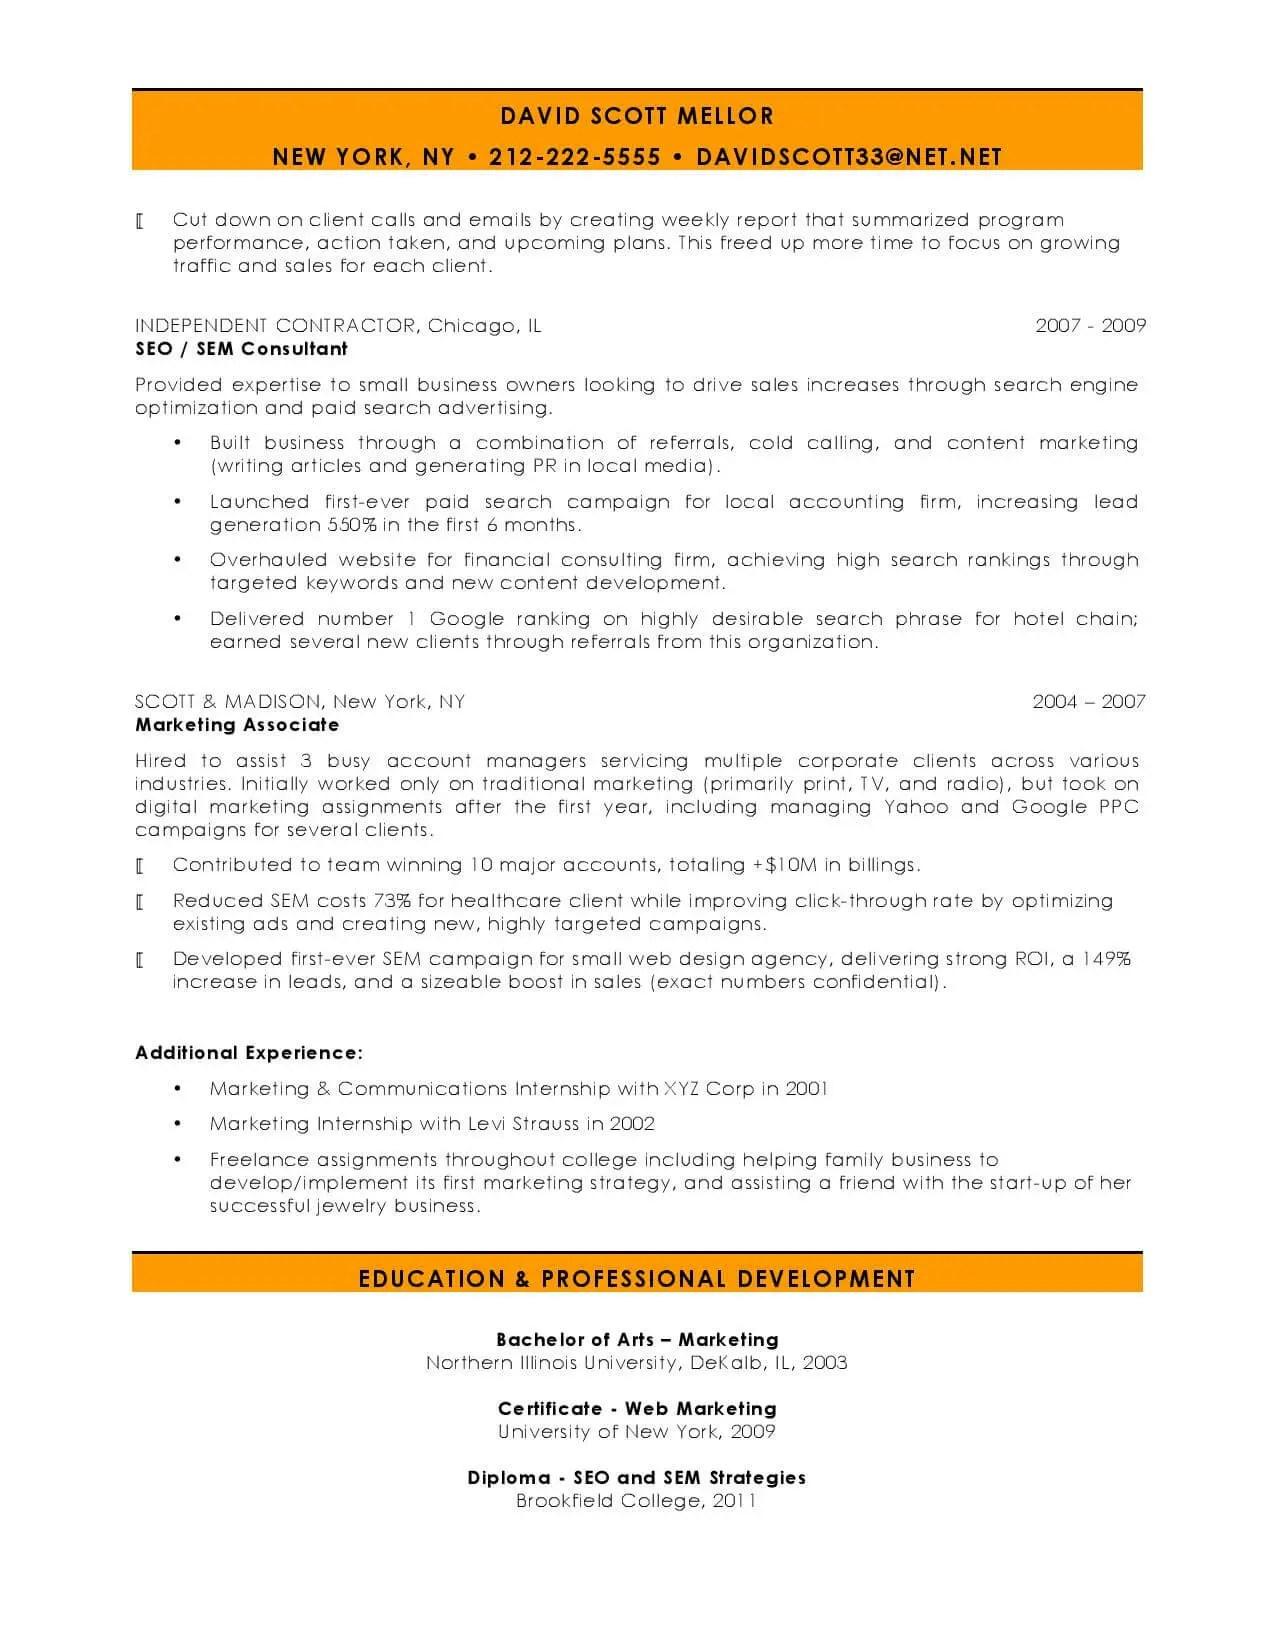 social media intern resume samples bio data maker social media intern resume samples social media intern internships 10 marketing resume samples hiring managers will